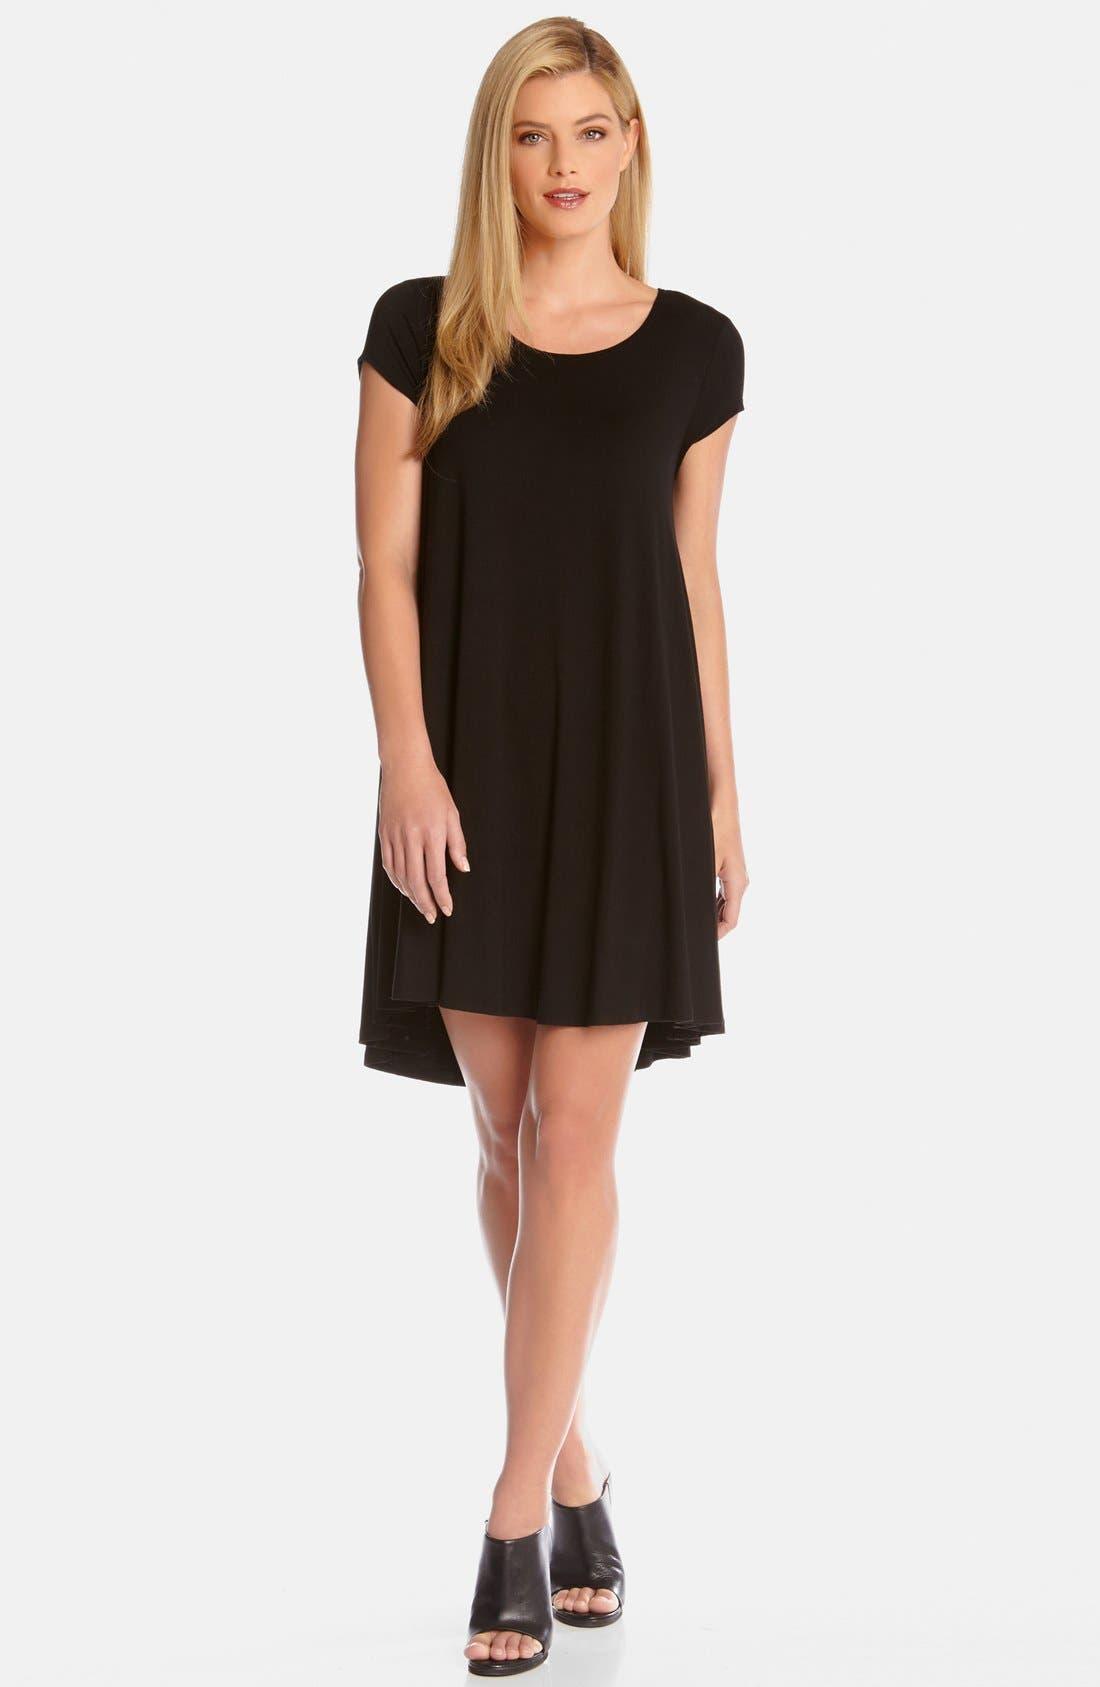 KAREN KANE, 'Maggie' Cap Sleeve Trapeze Dress, Main thumbnail 1, color, BLACK